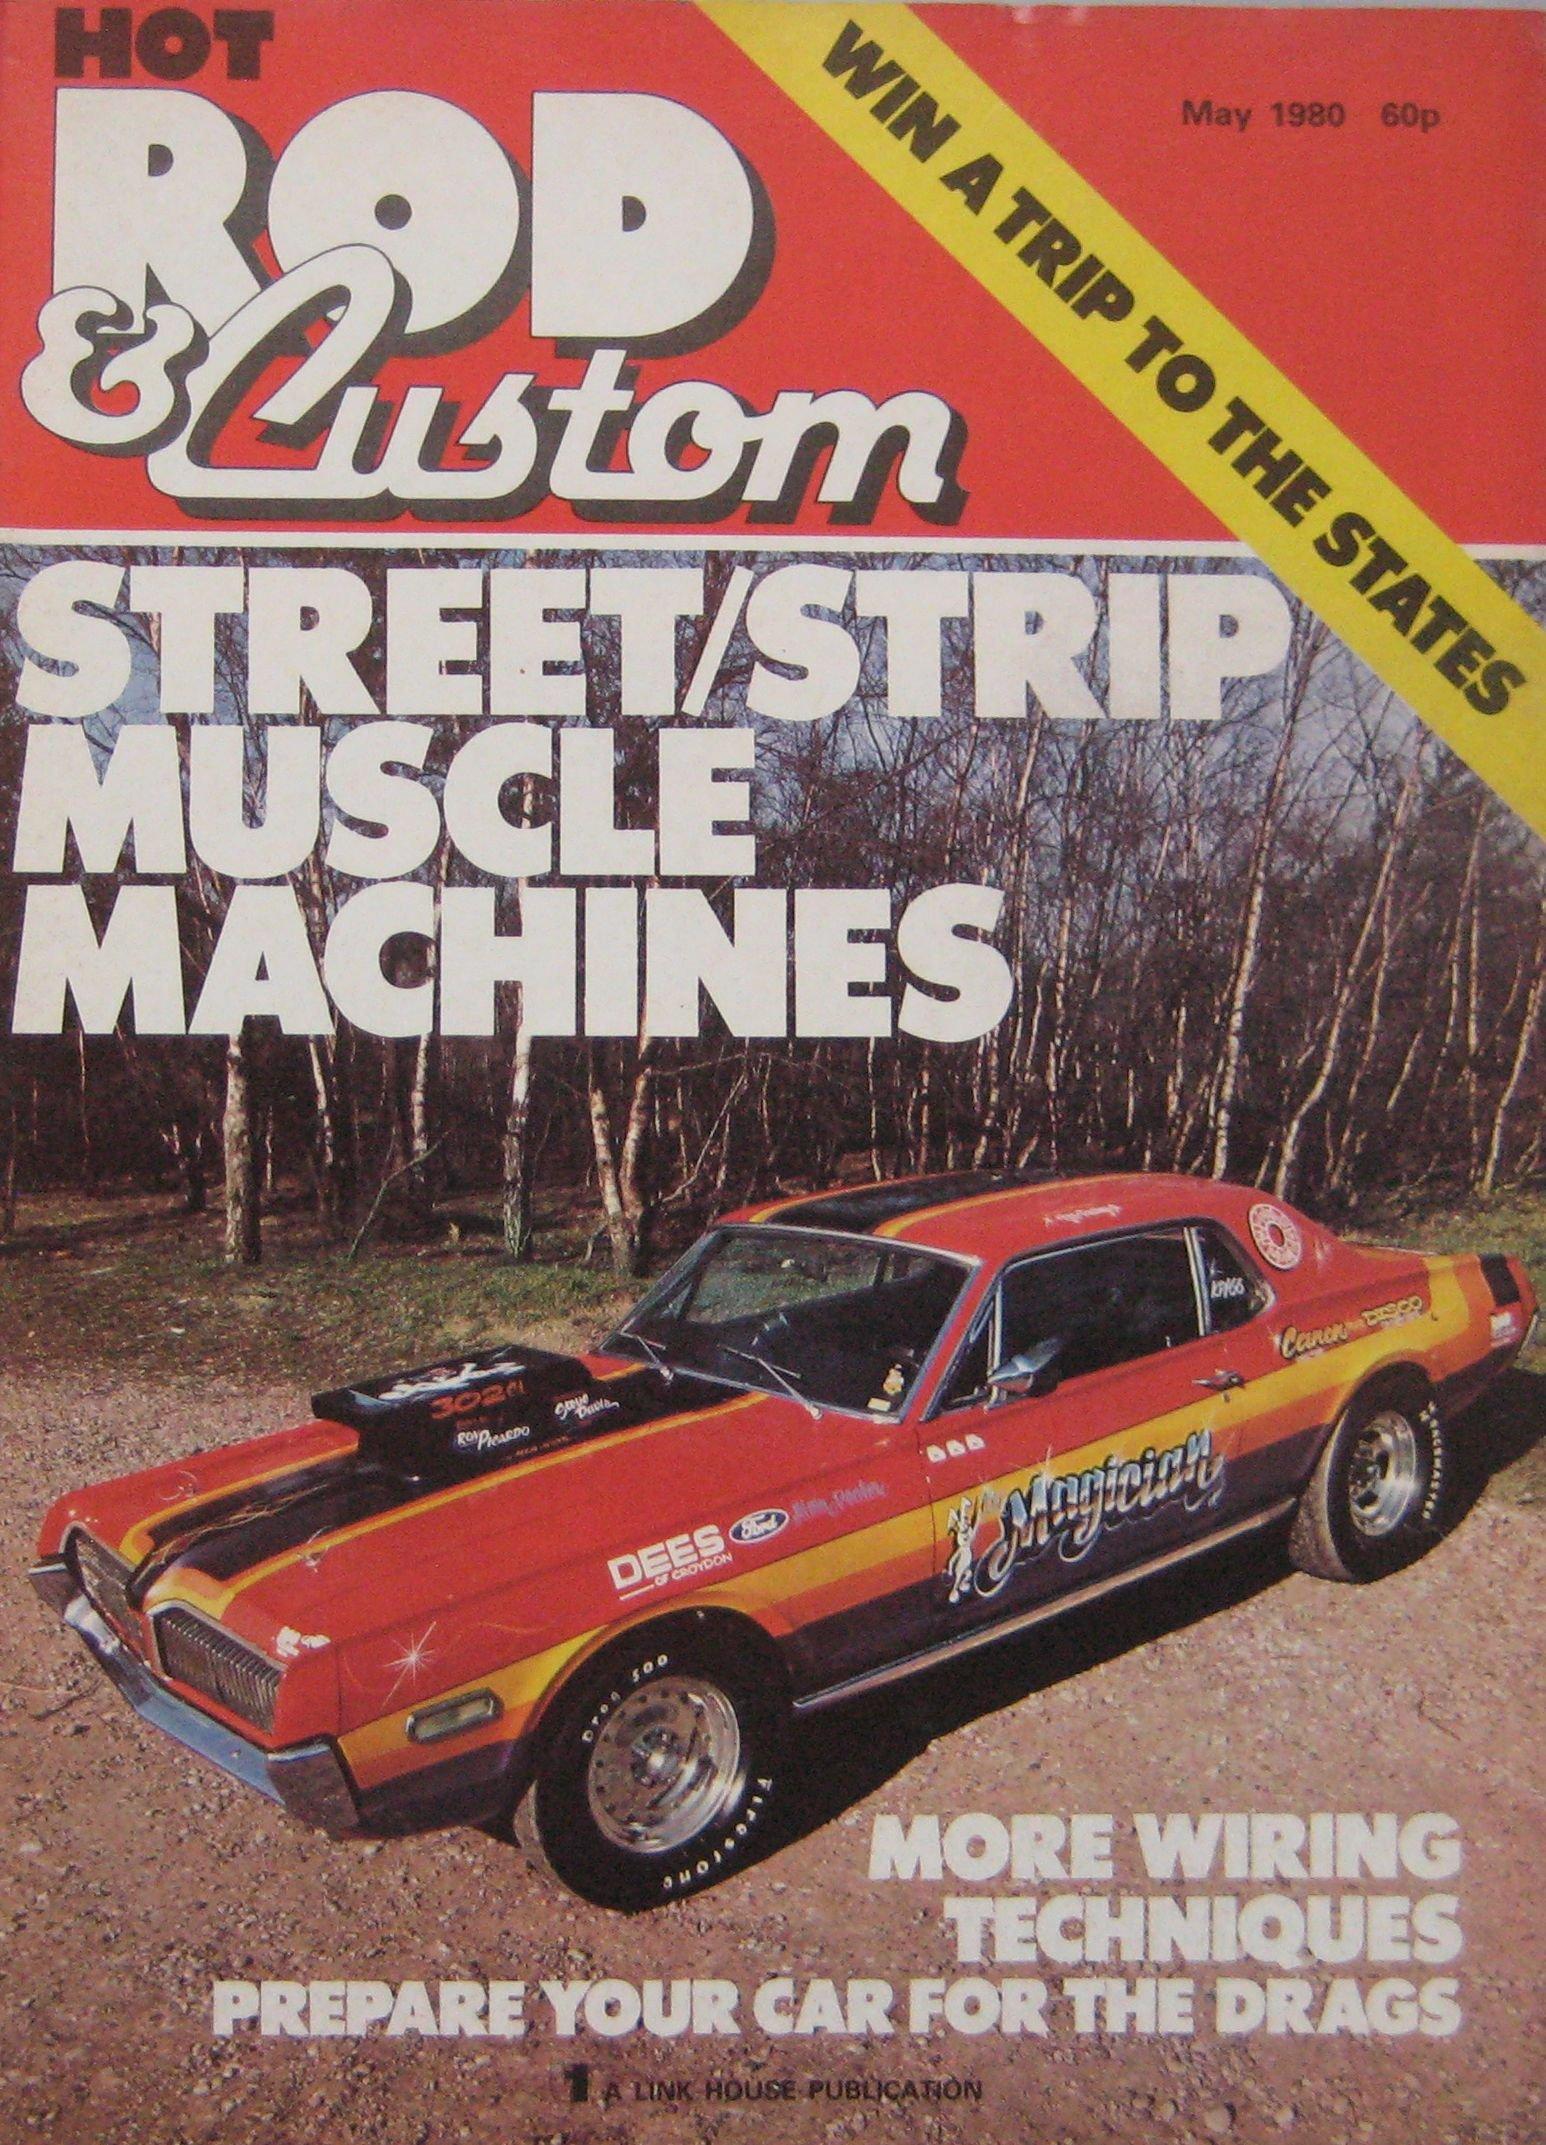 Hot Rod Custom Magazine May 1980 Ian Penberthy House Wiring Techniques 0732330906805 Books